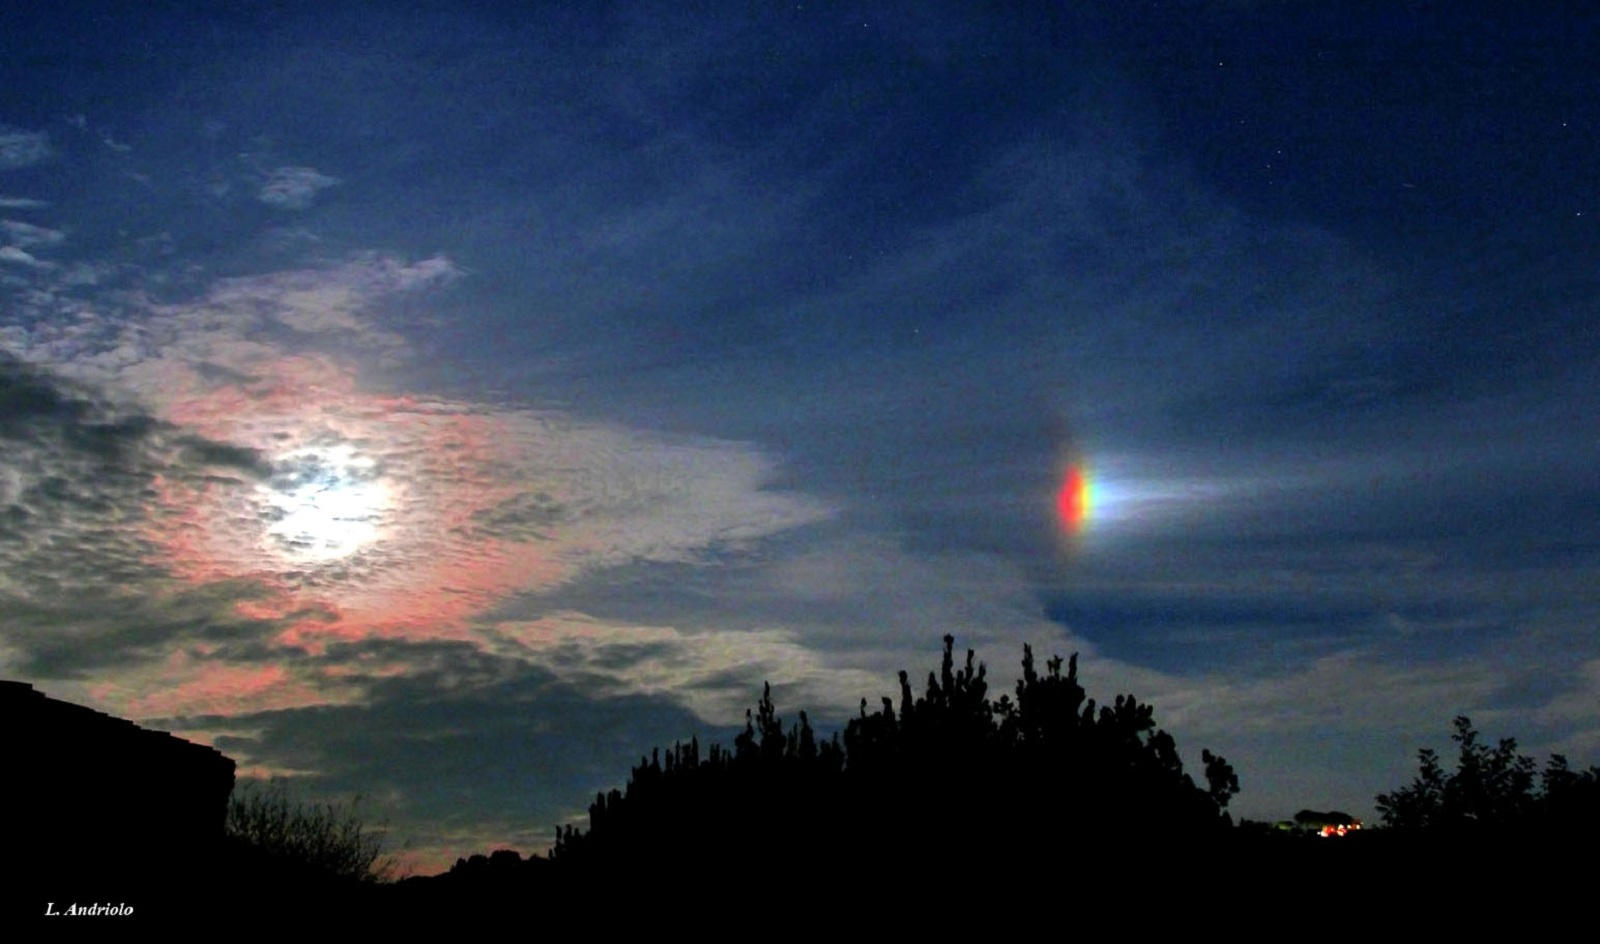 Paraselenio: il rarissimo fenomeno atmosferico avvistato in Toscana